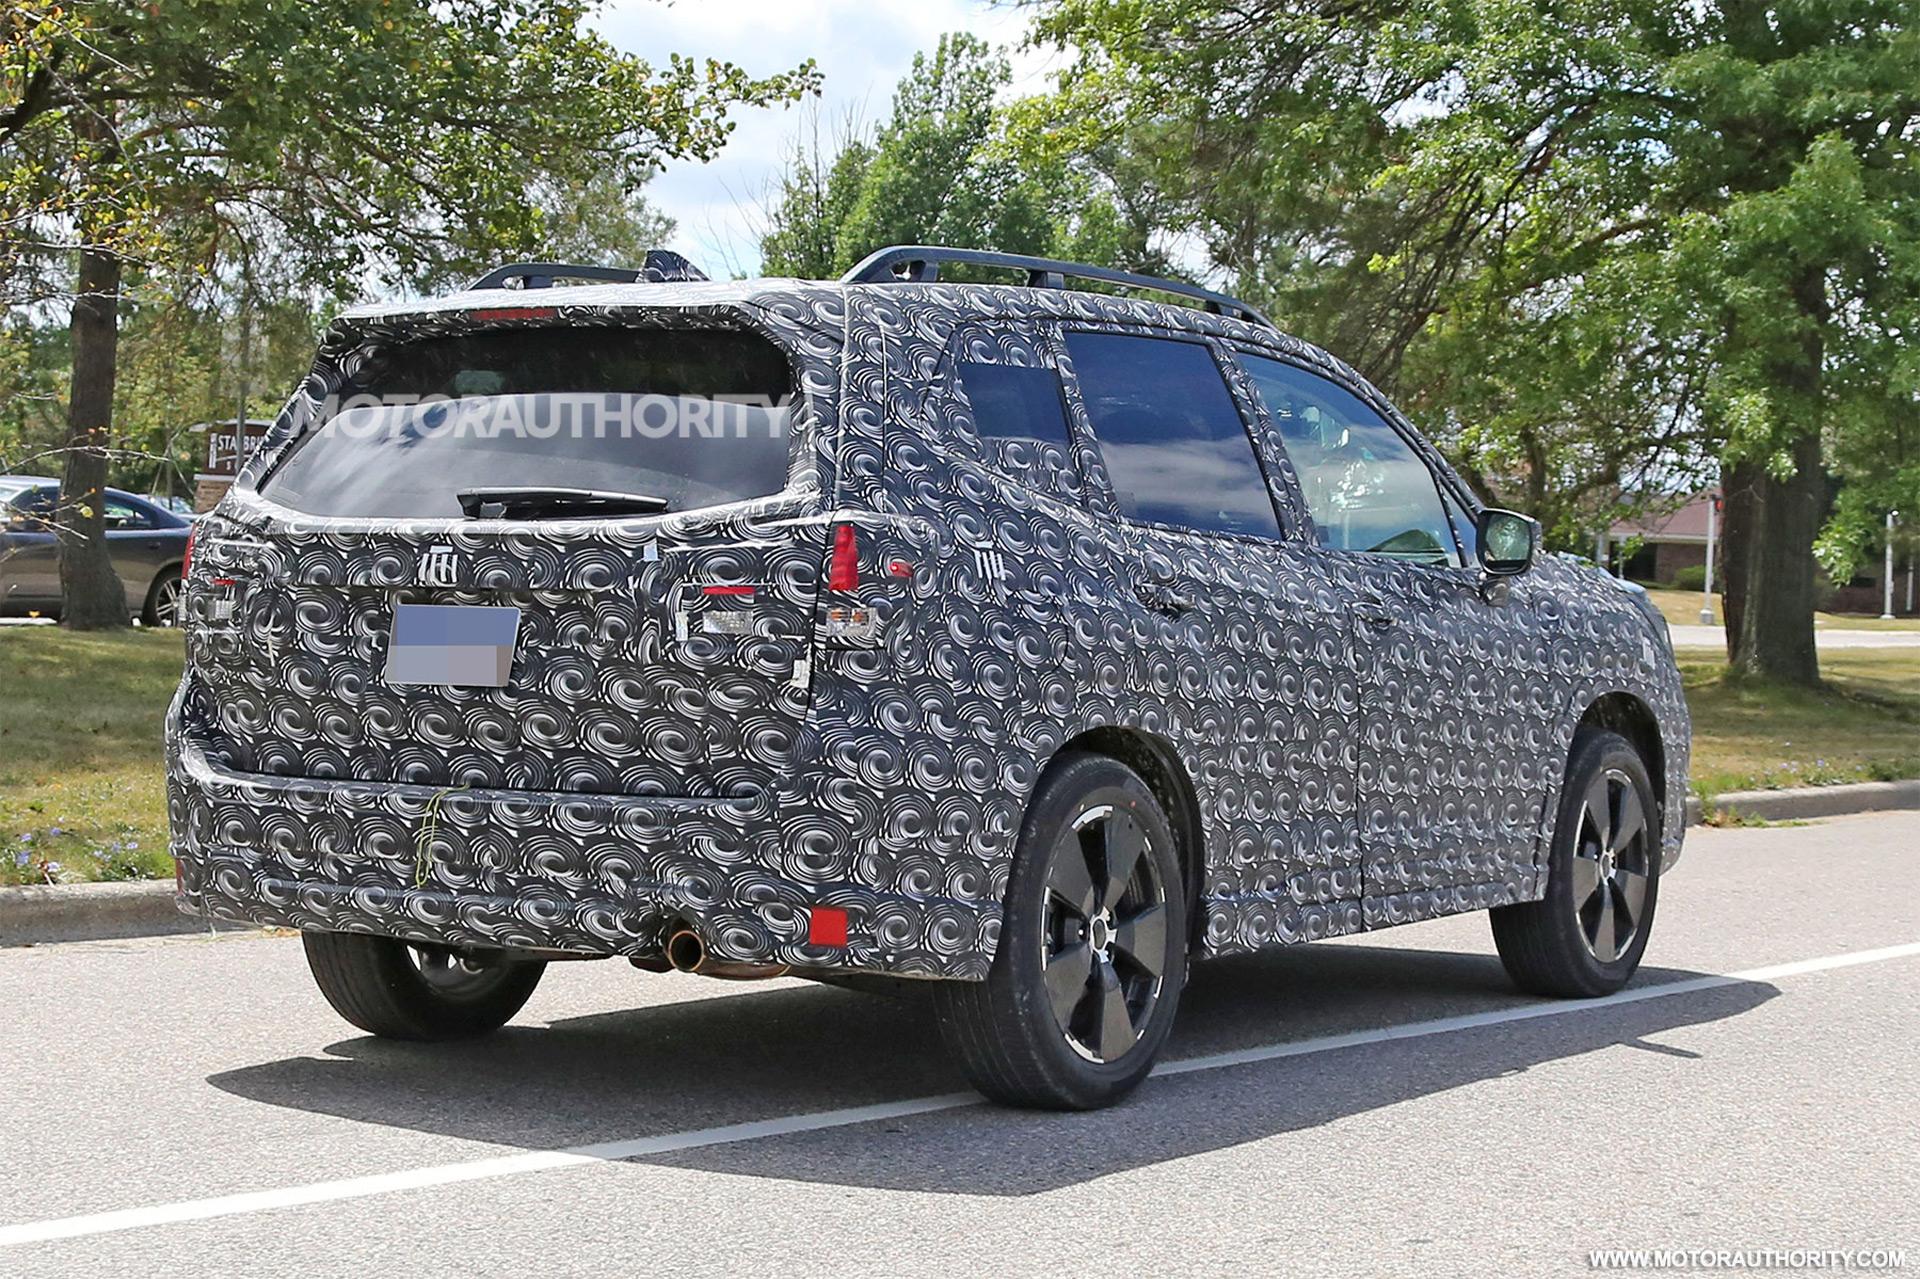 2019 Subaru Forester spy shots | Autozaurus